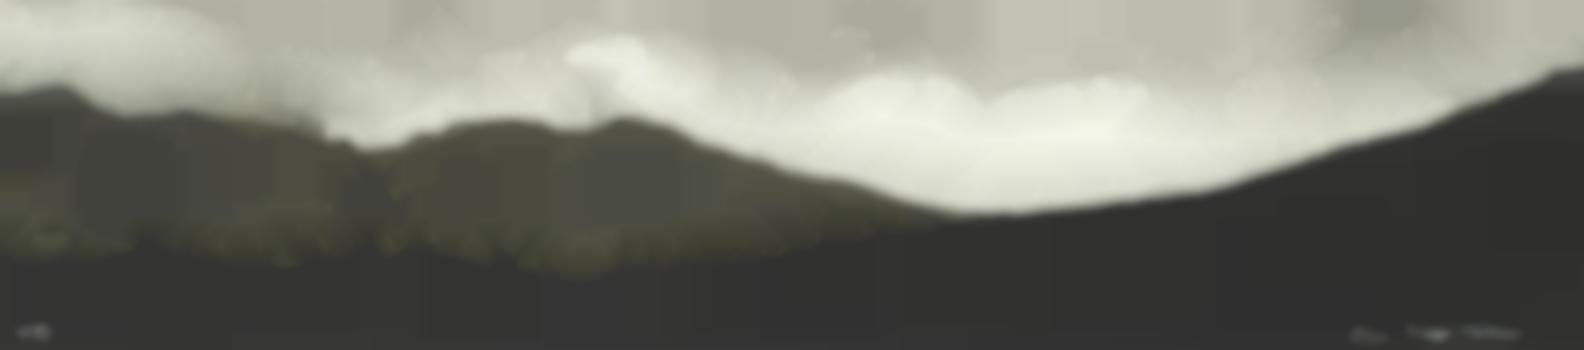 John Knapp-Fisher - Hill Skyline - Pembrokeshire-1985